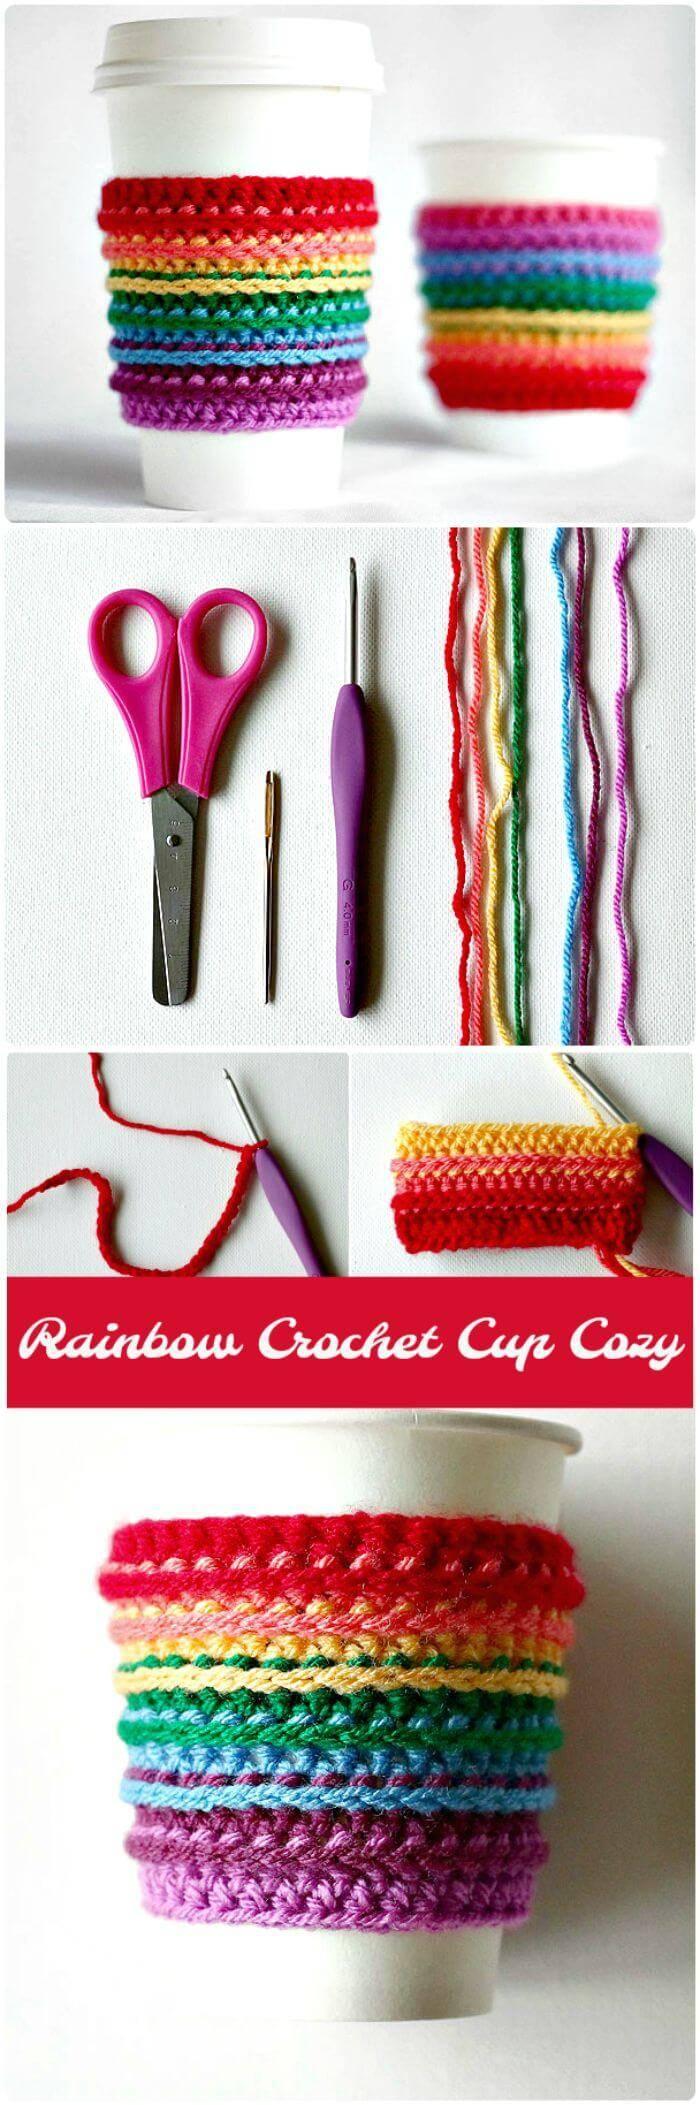 Rainbow Crochet Cup Cozy